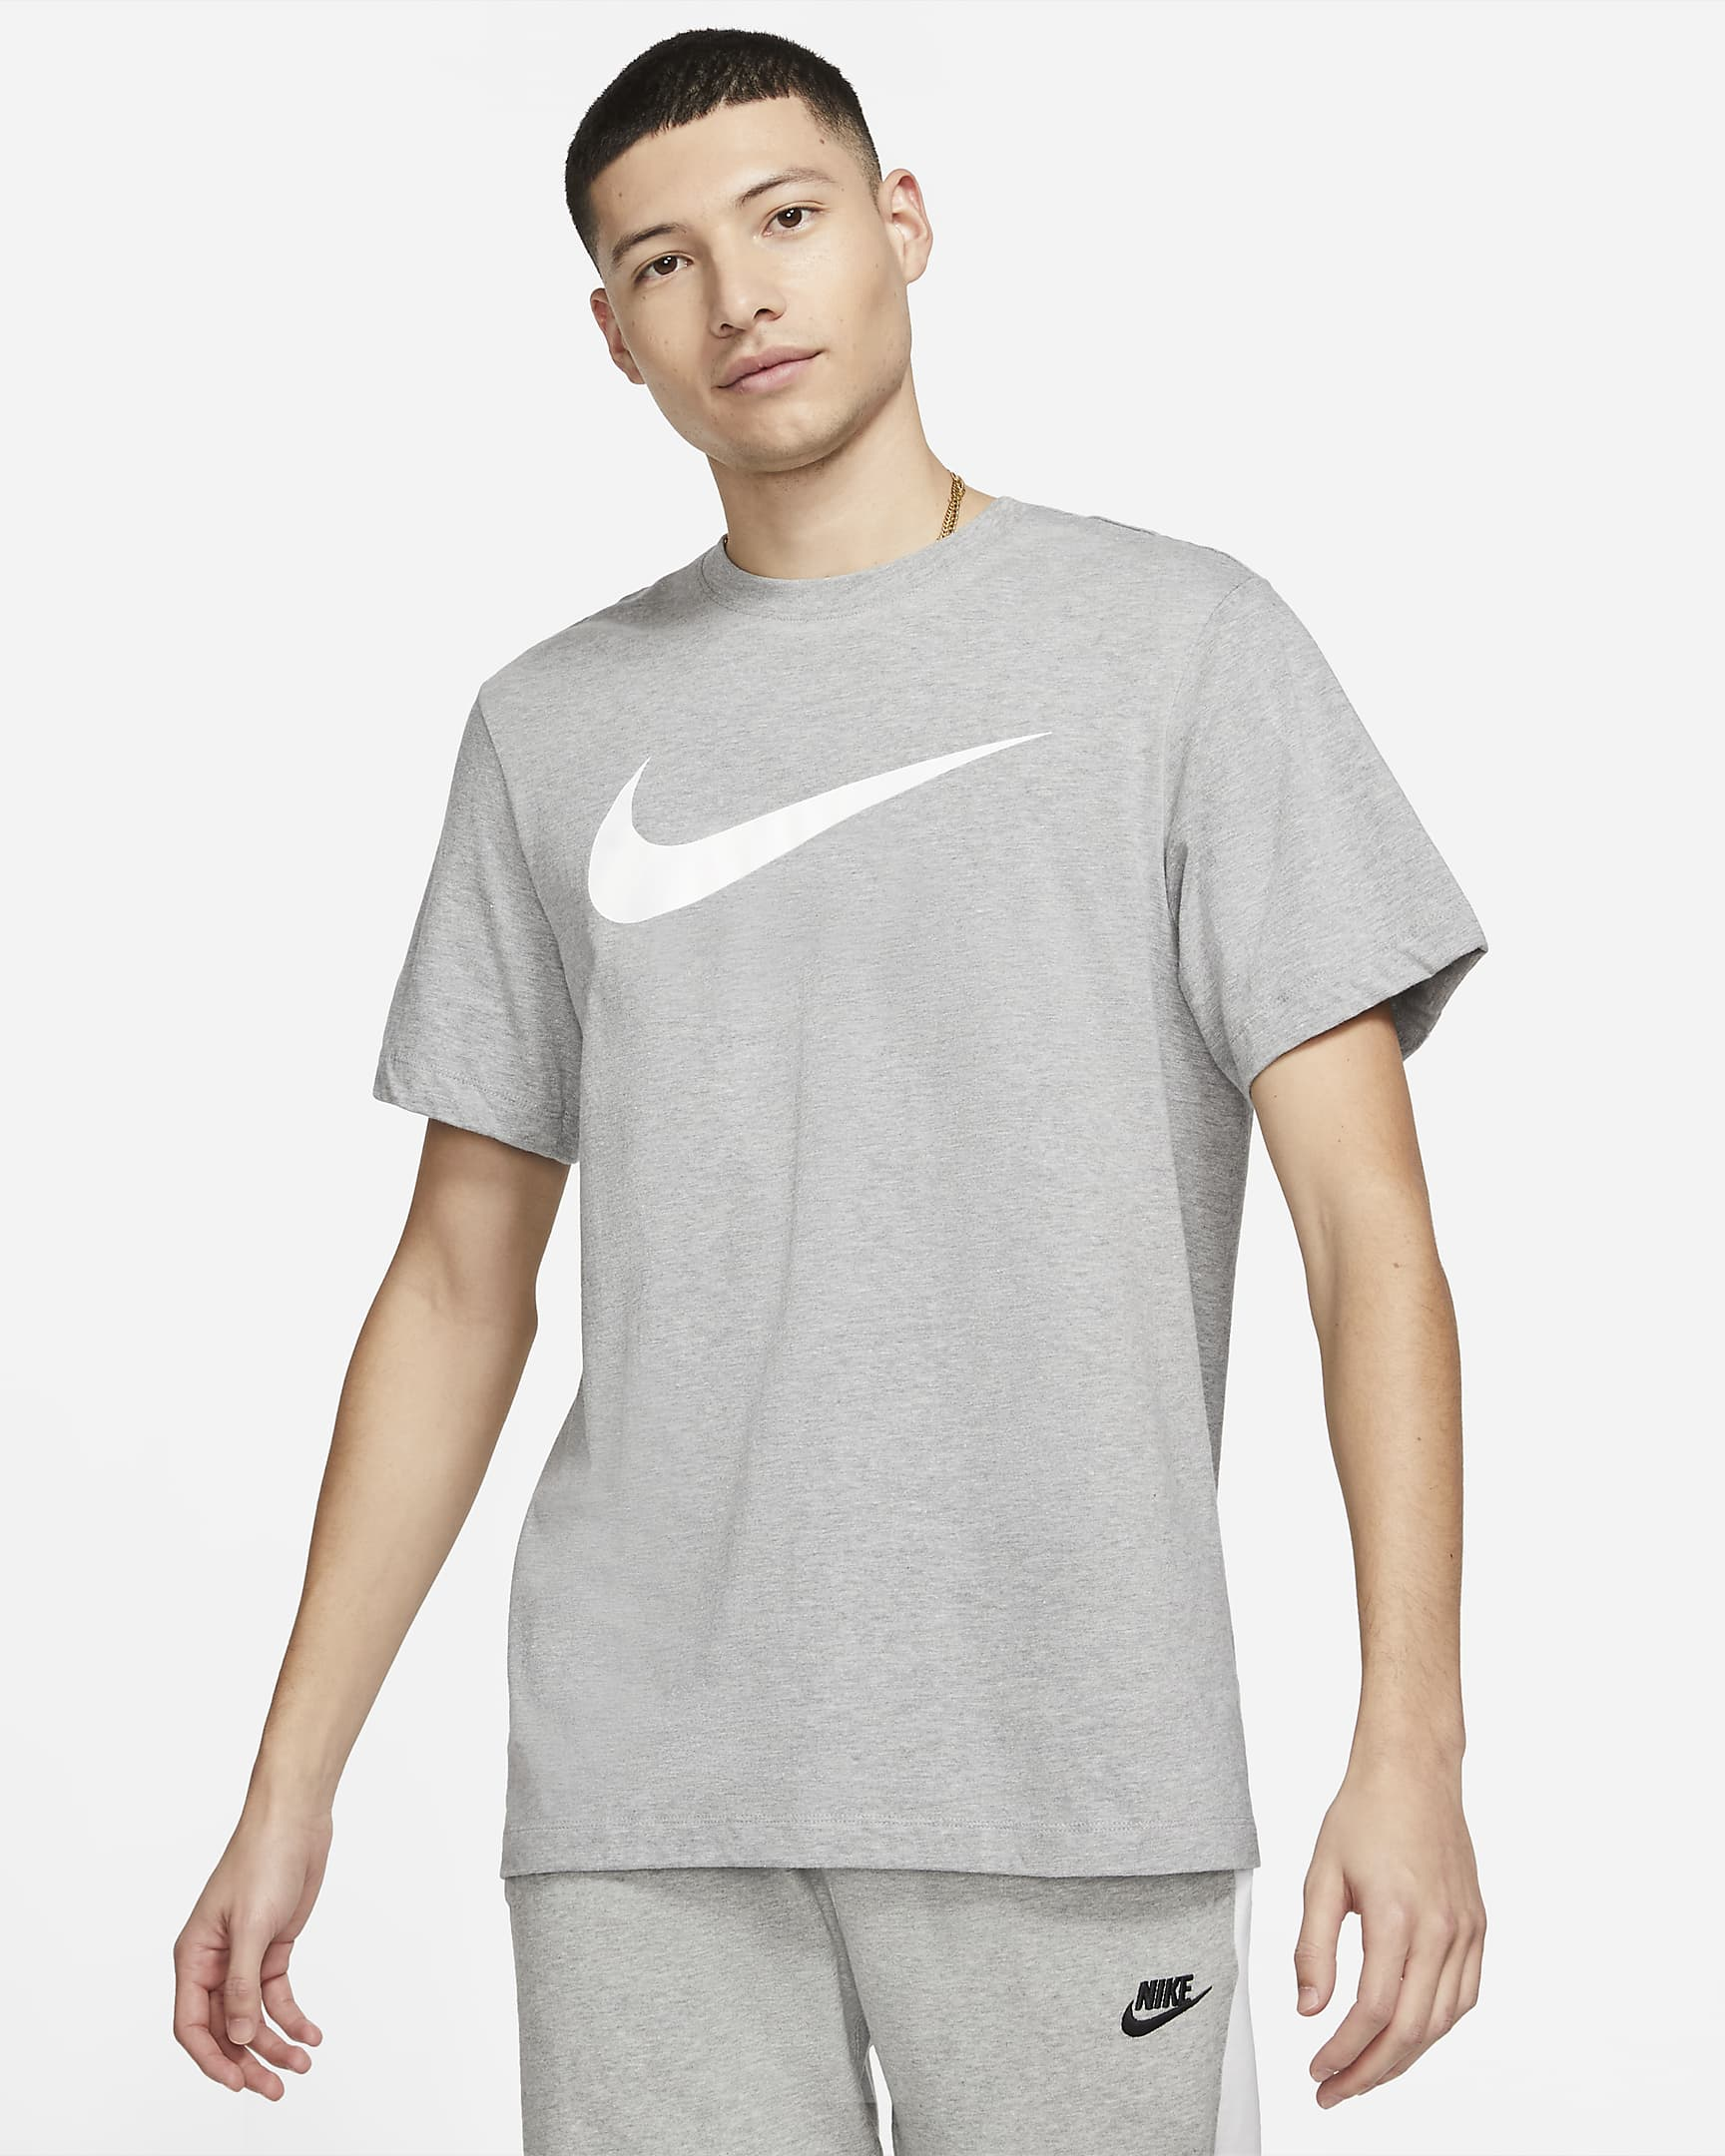 nike-sportswear-swoosh-mens-t-shirt-LzncrX.png